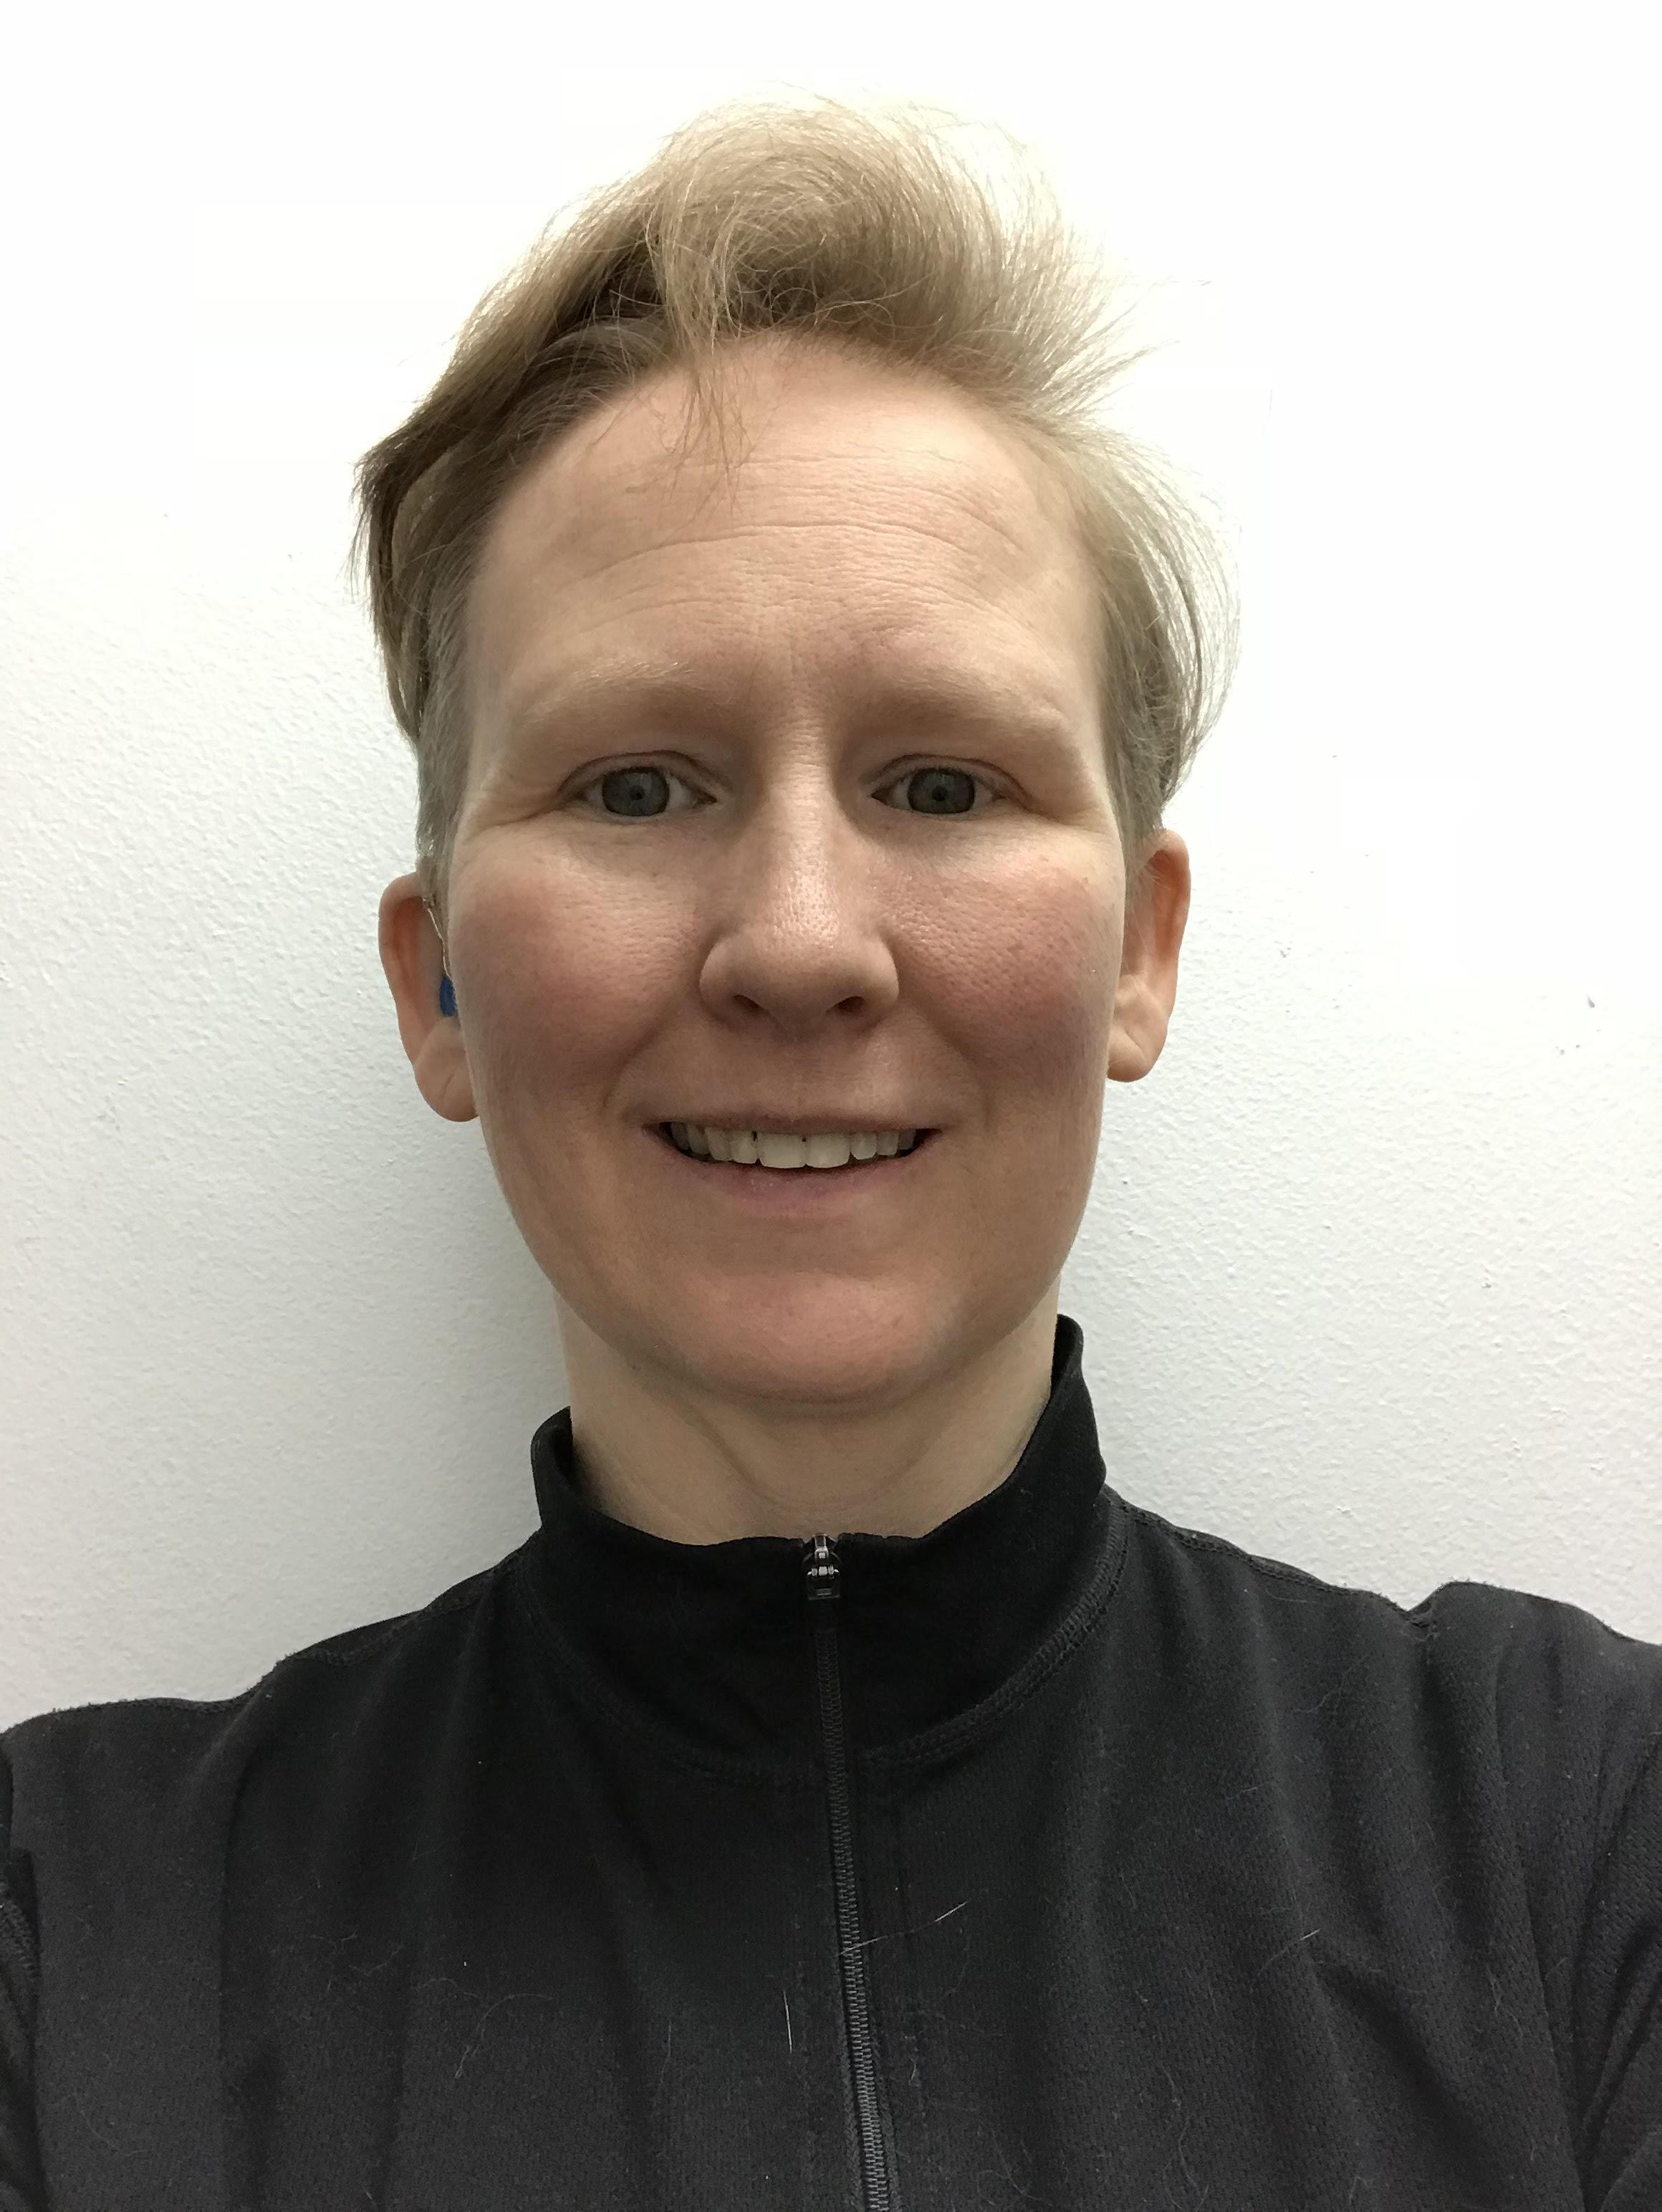 Sunsational Private Swim Lesson Instructor in Philadelphia - Jennifer H